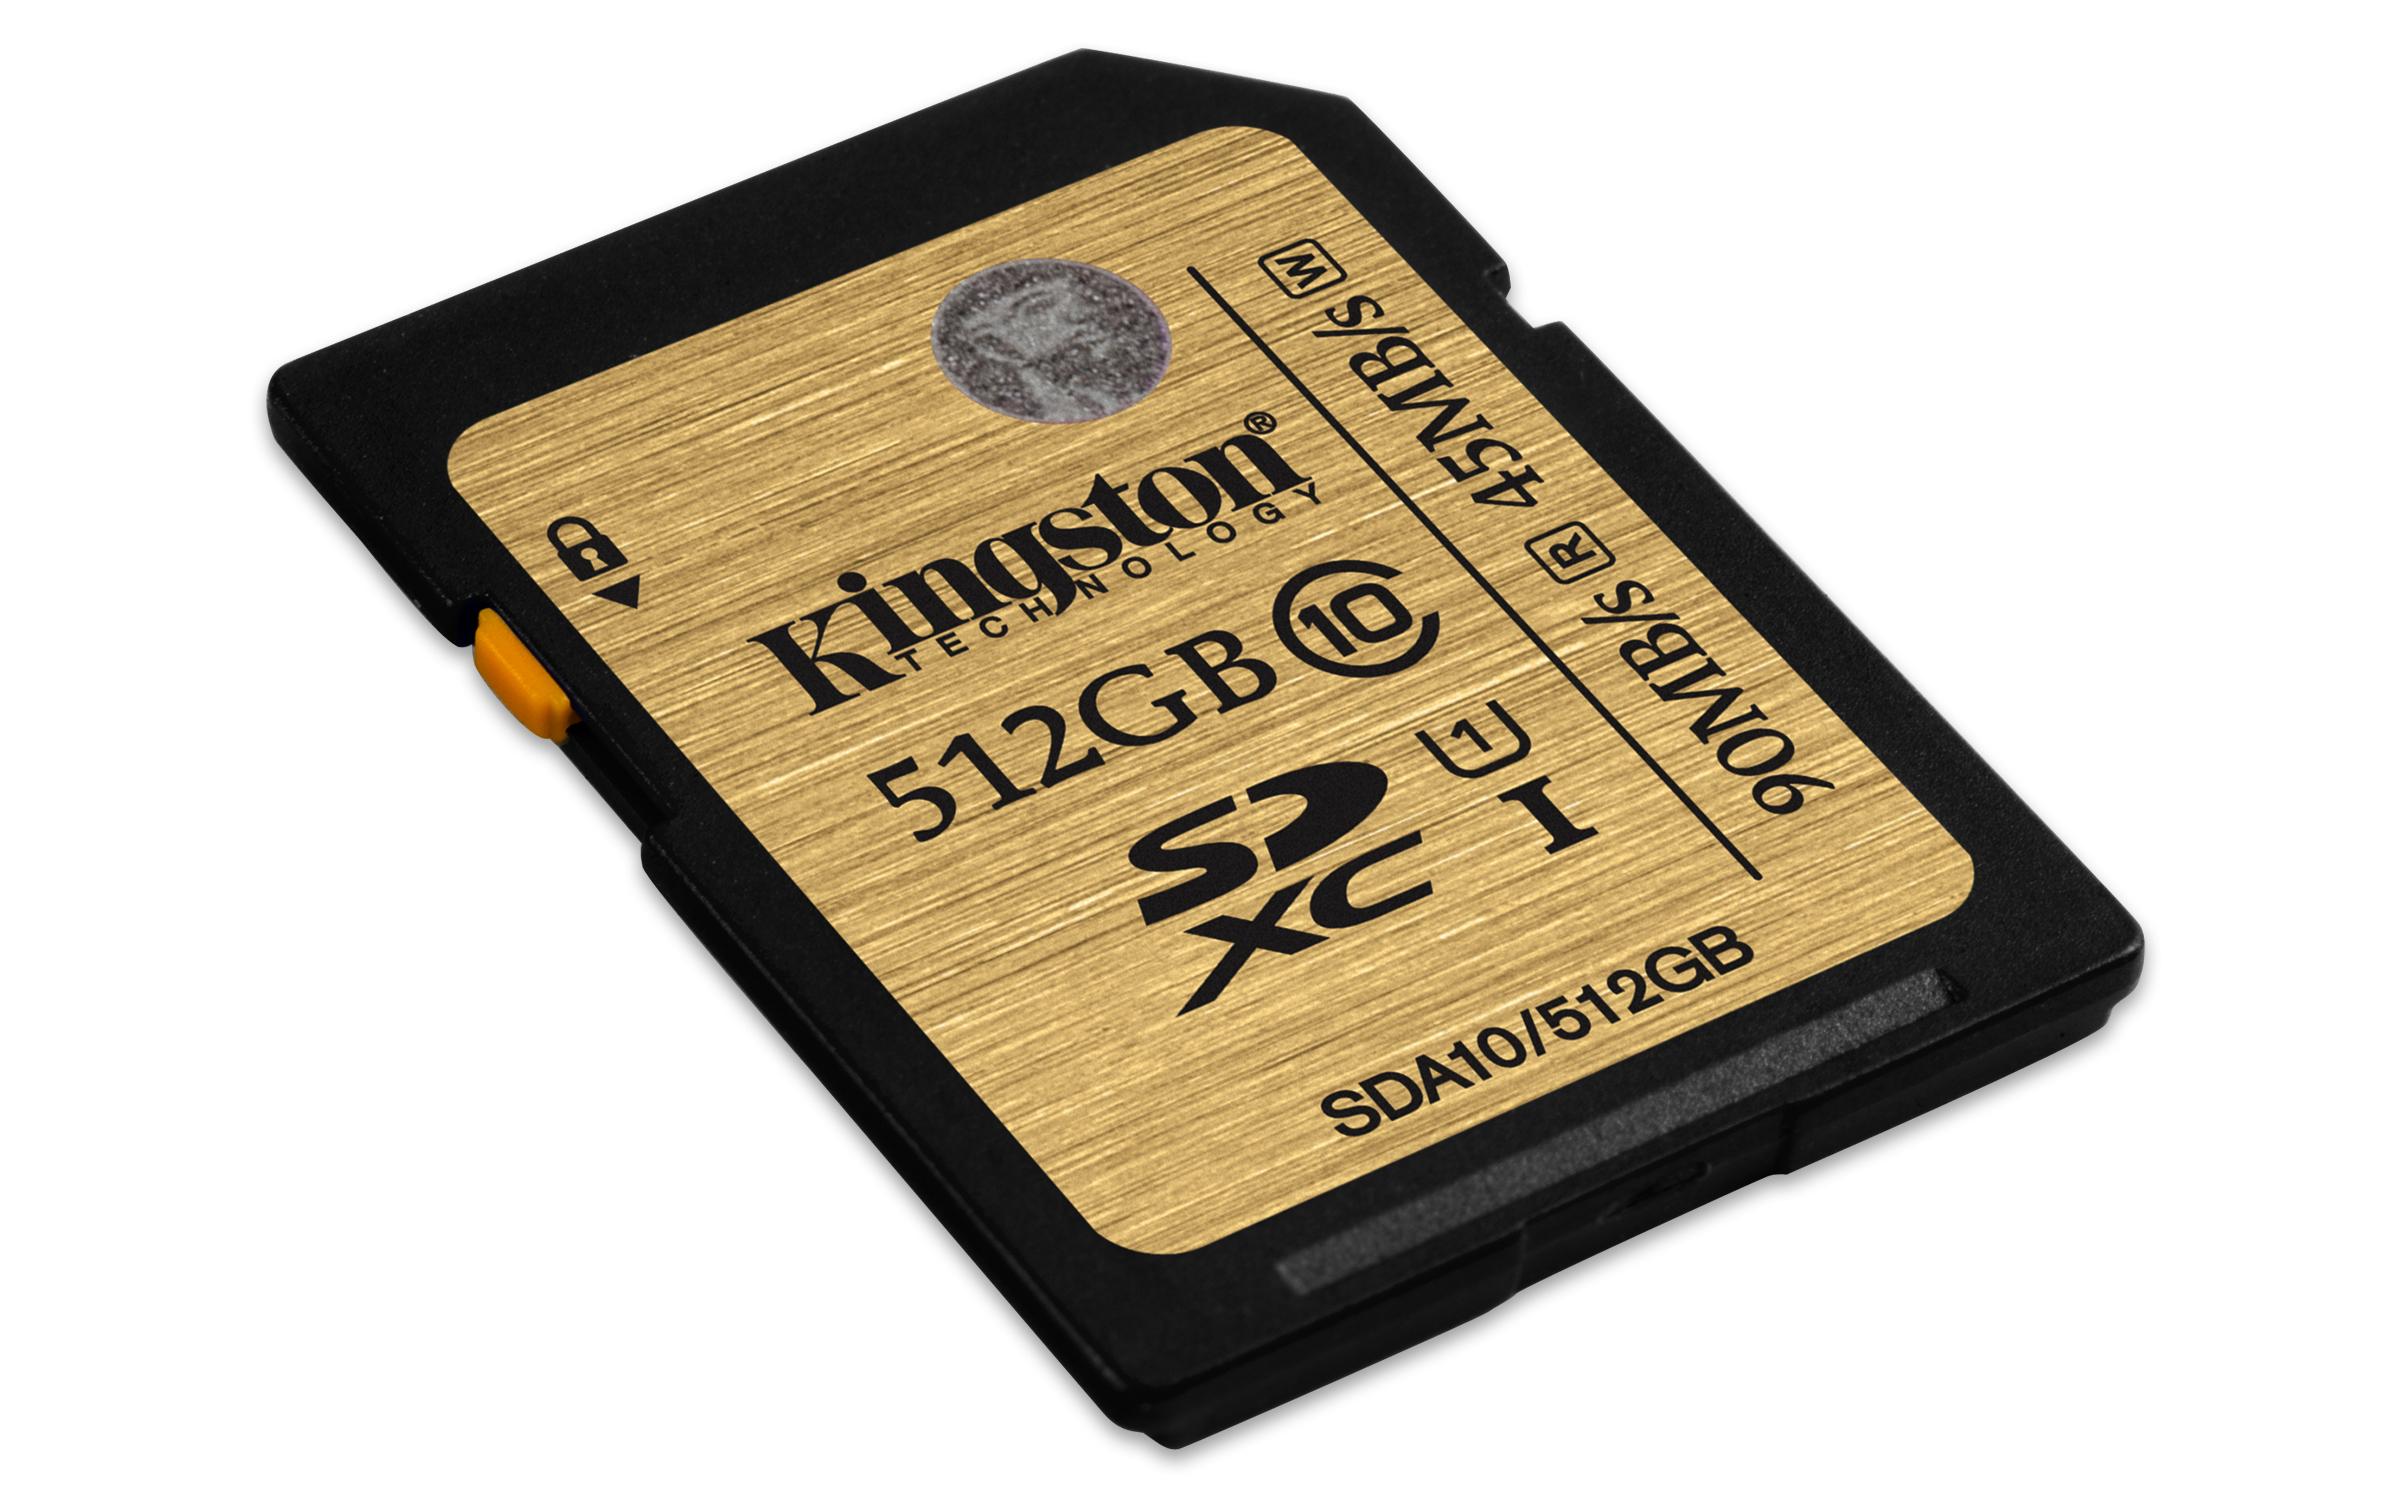 Kingston Technology 512GB SDXC UHS-I Class 10 512GB SDXC UHS-I Class 10 memory card